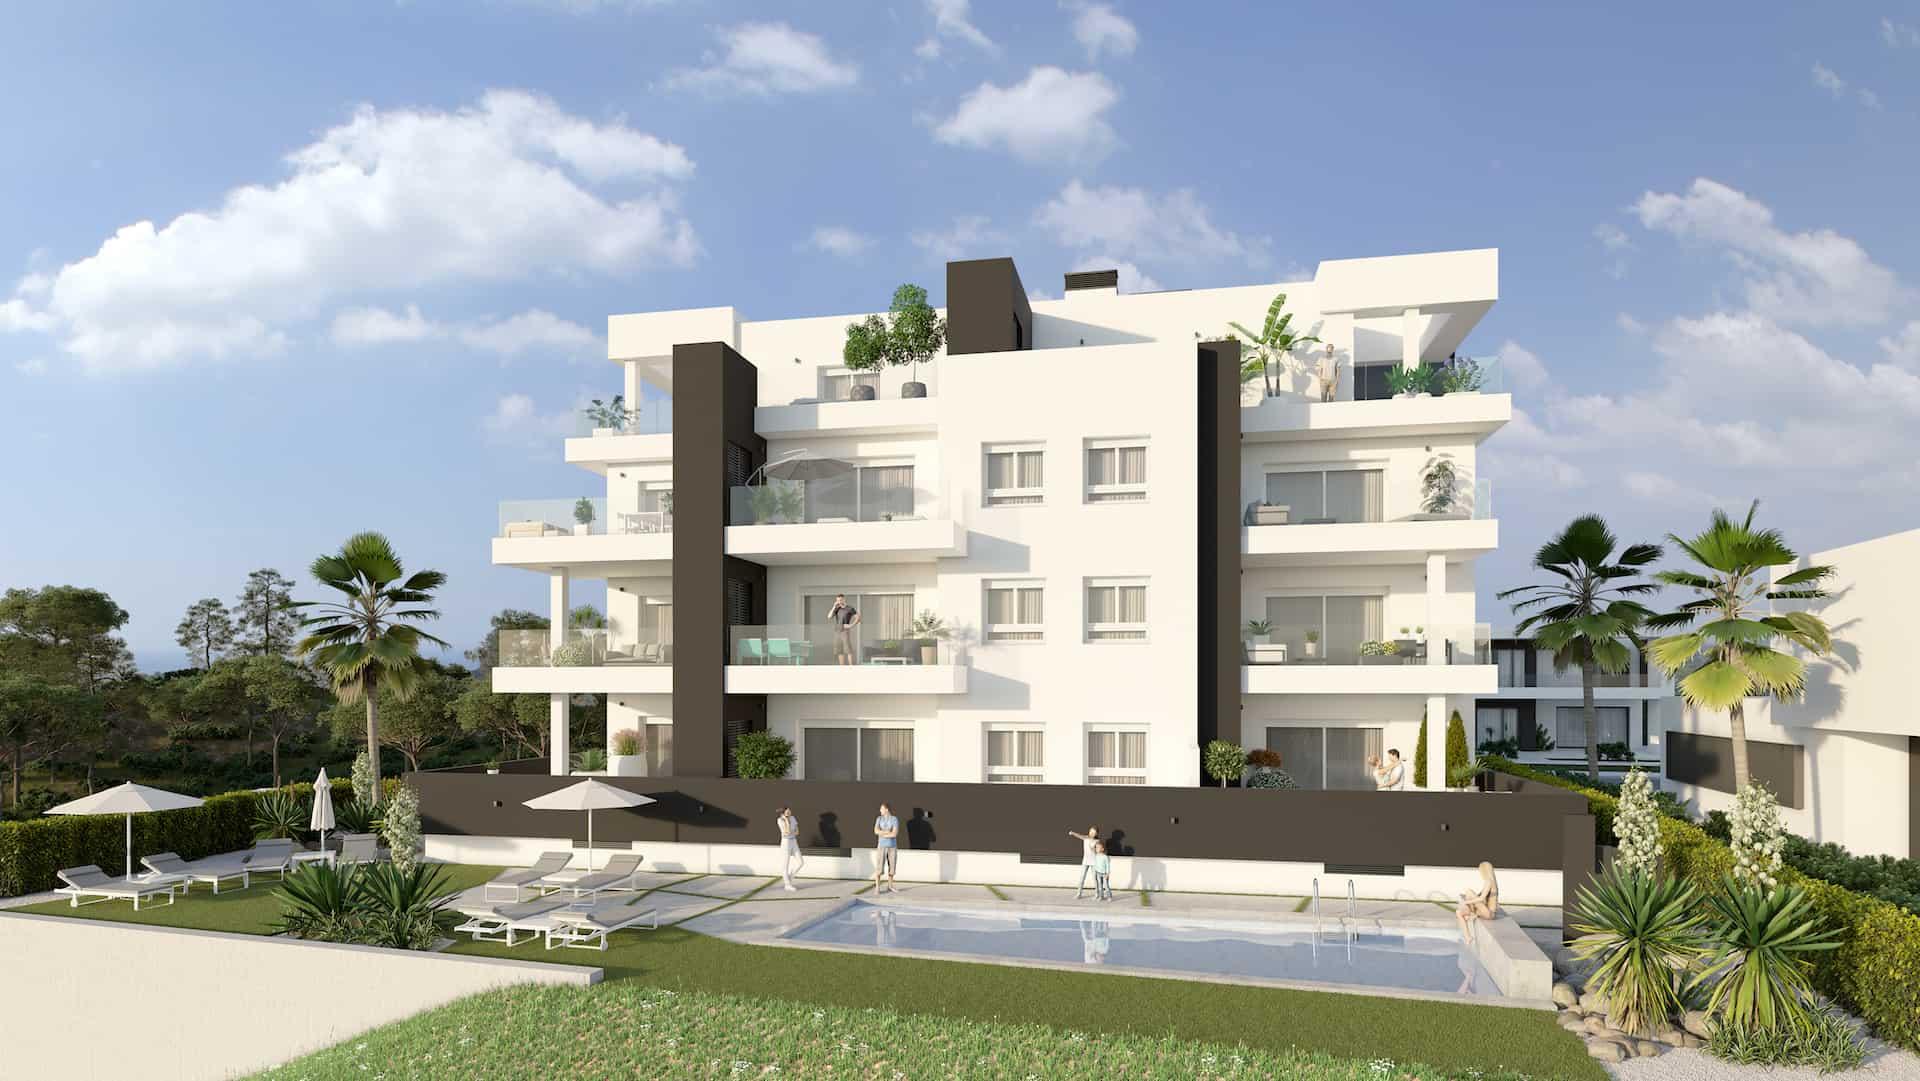 Ref:RH-21819-property Apartment For Sale in Villamartin